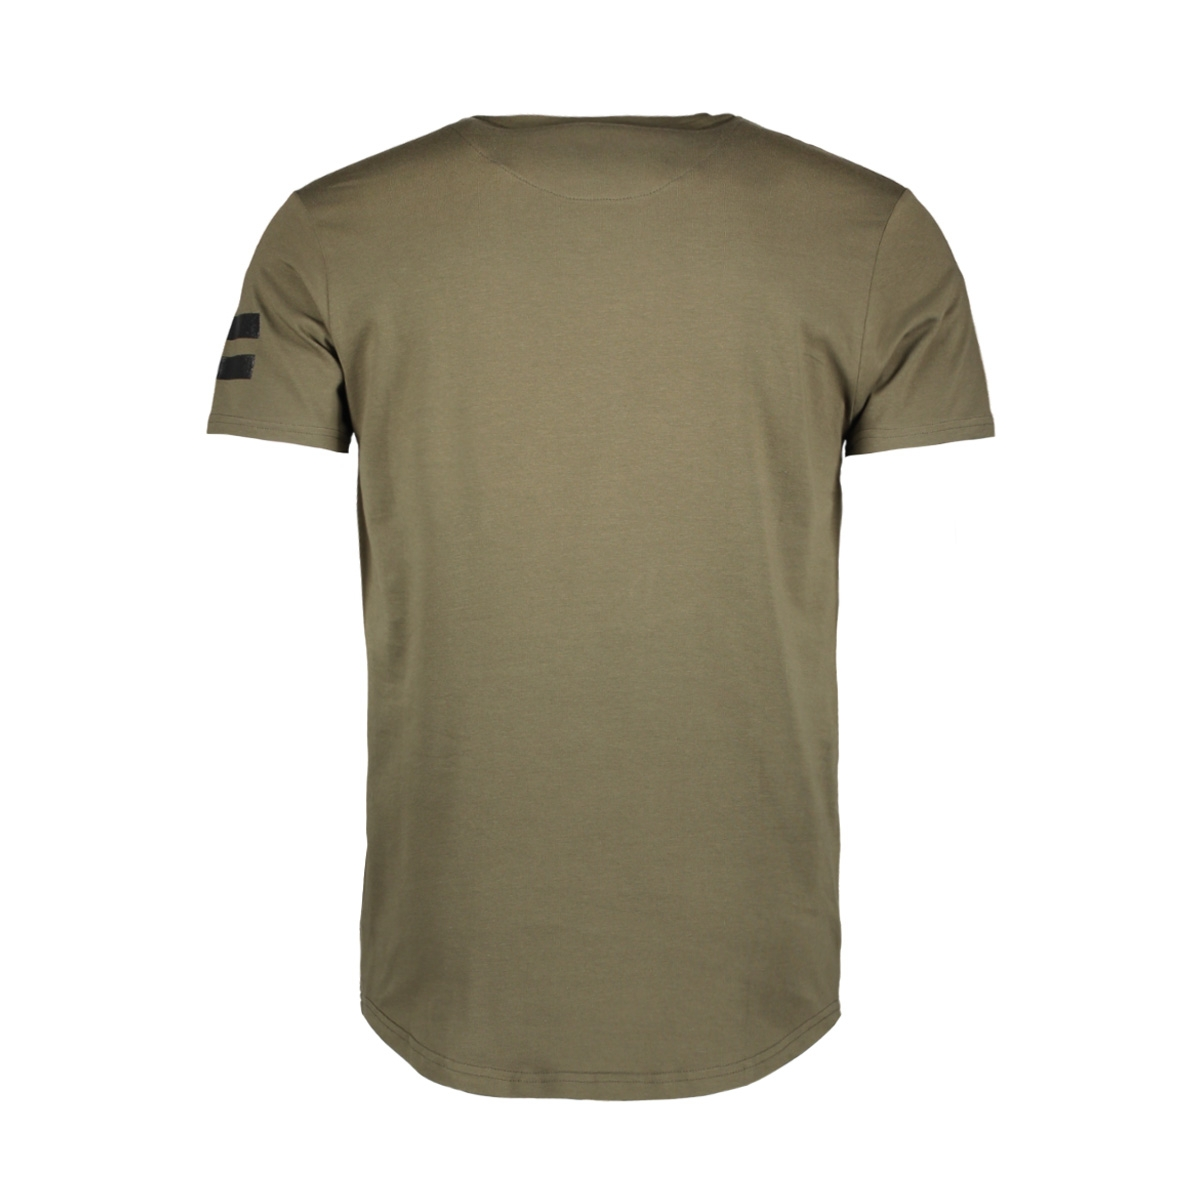 13861 gabbiano t-shirt army